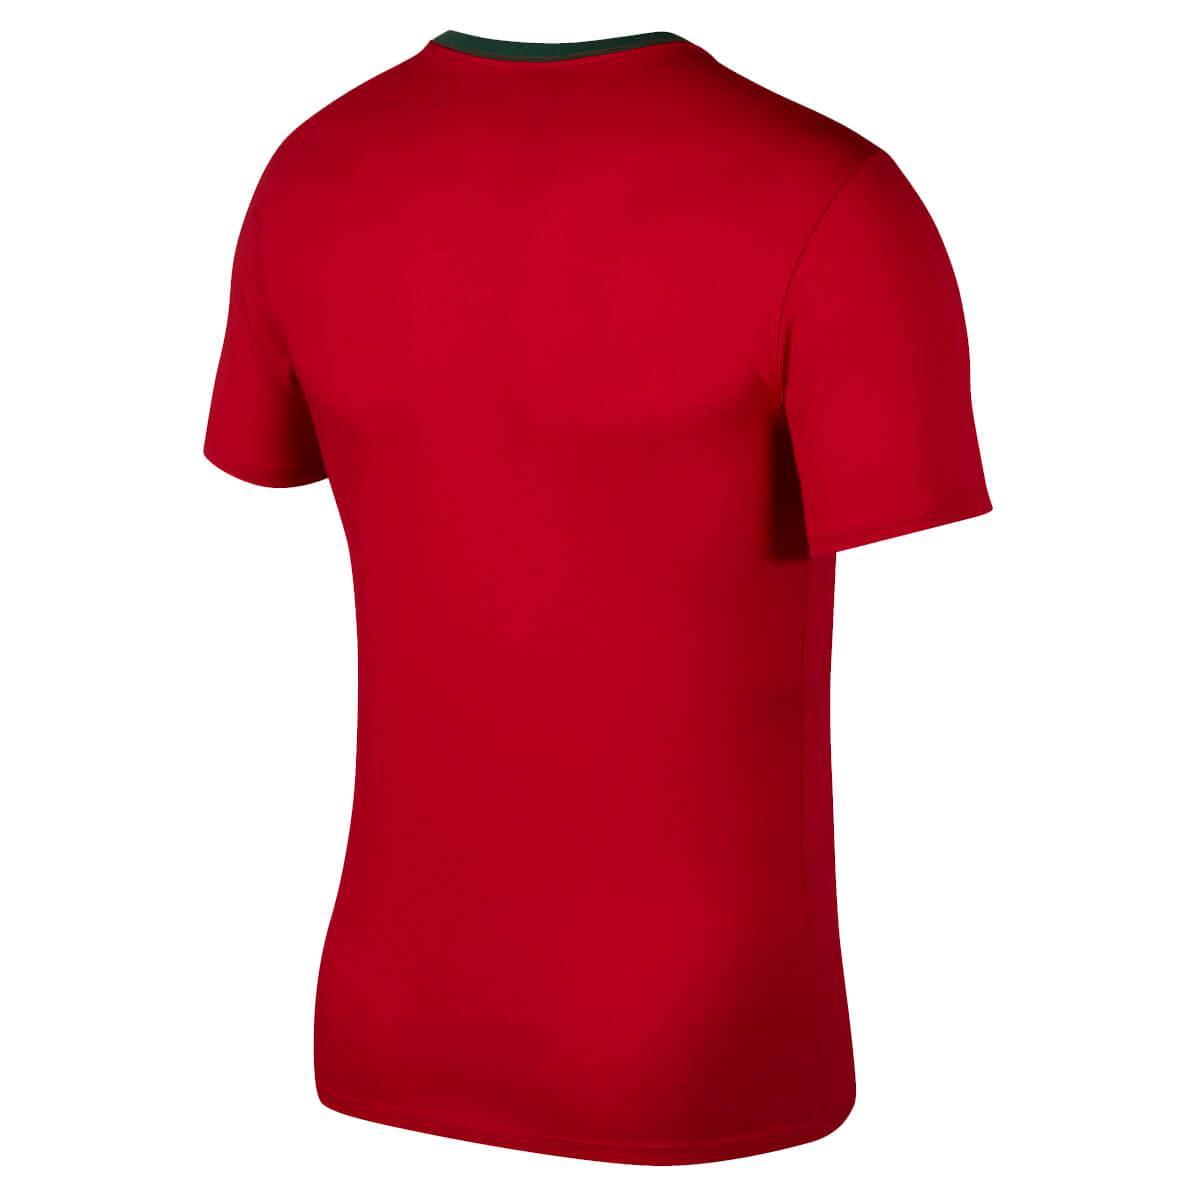 8dc3bde32 Camiseta Nike Portugal 2018 19 Crest Masculina